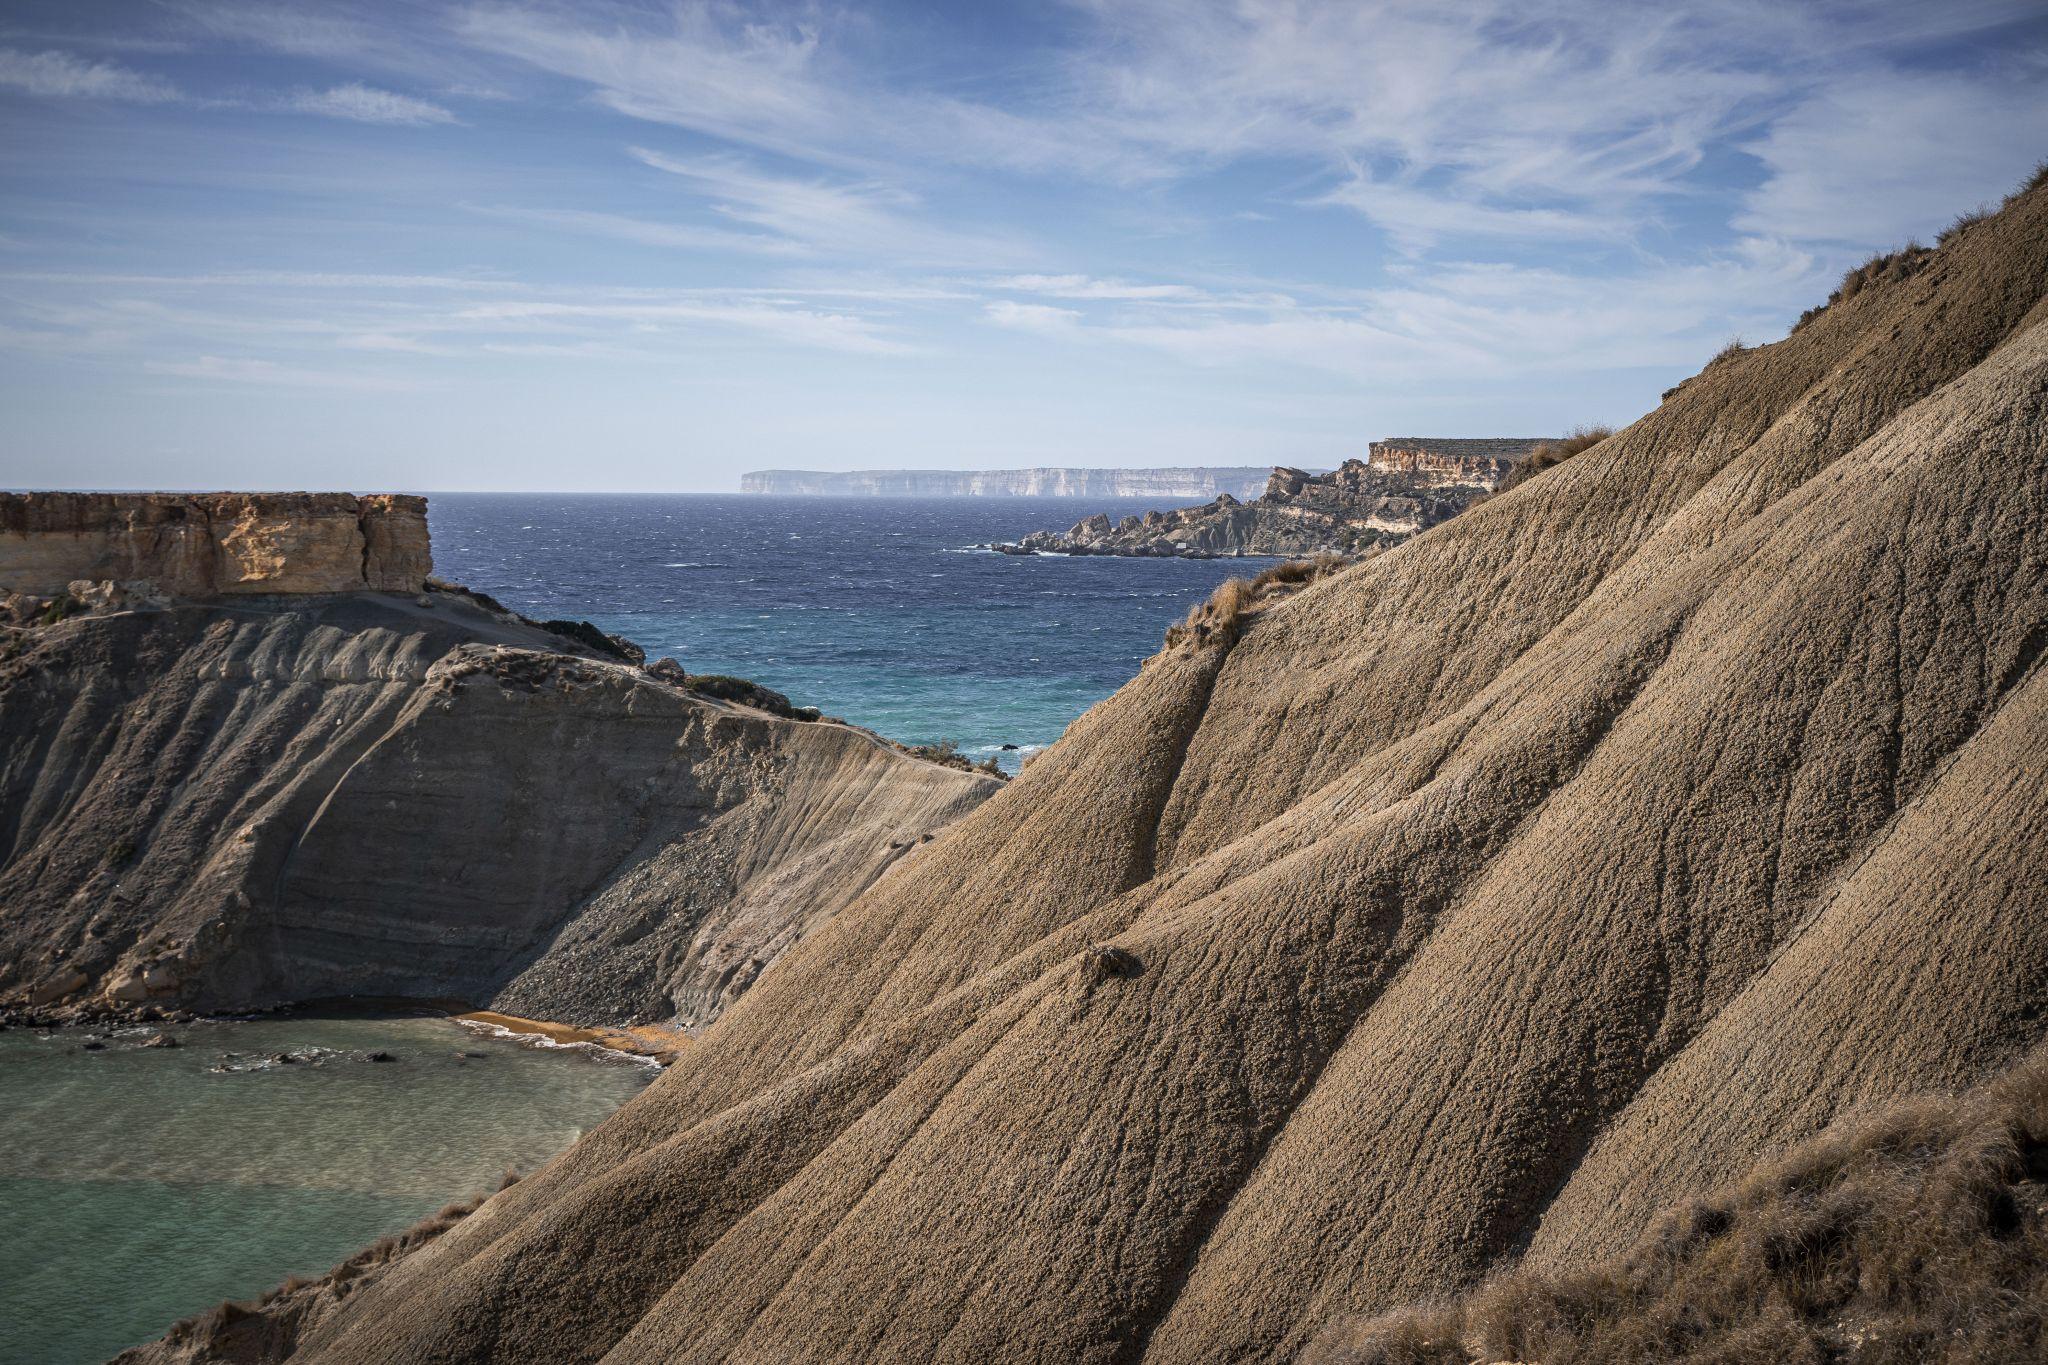 Clay Cliffs and Beyond, Malta